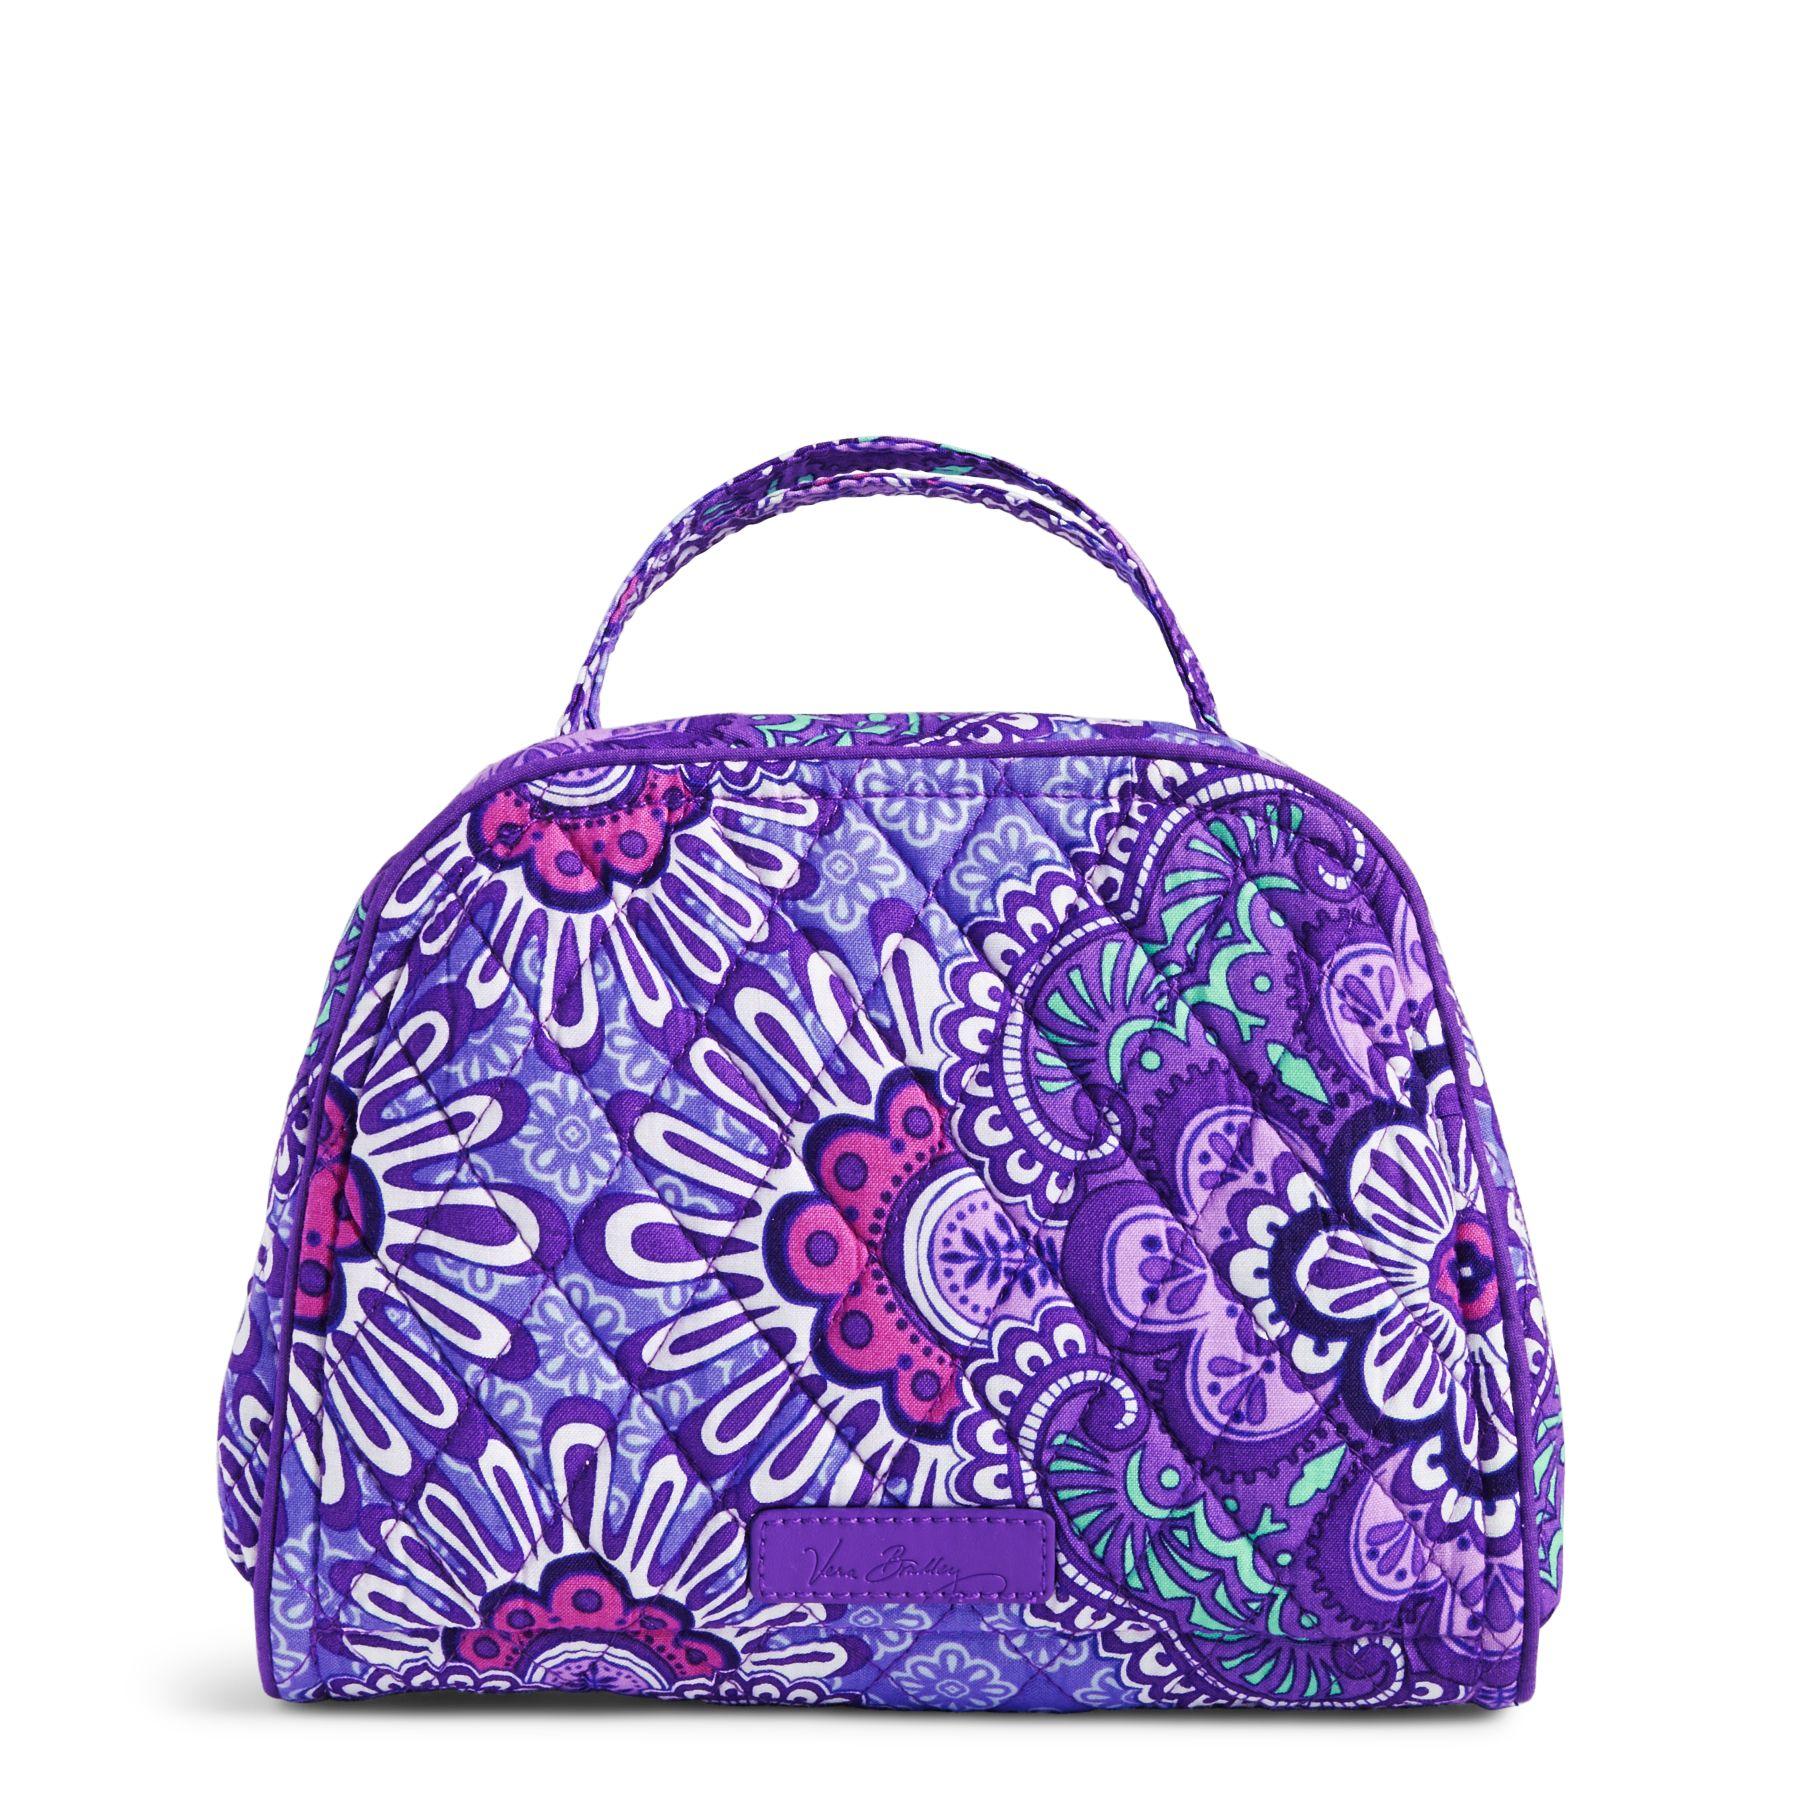 Panoty Store Vera Bradley Designs Inc Travel Travel Packing